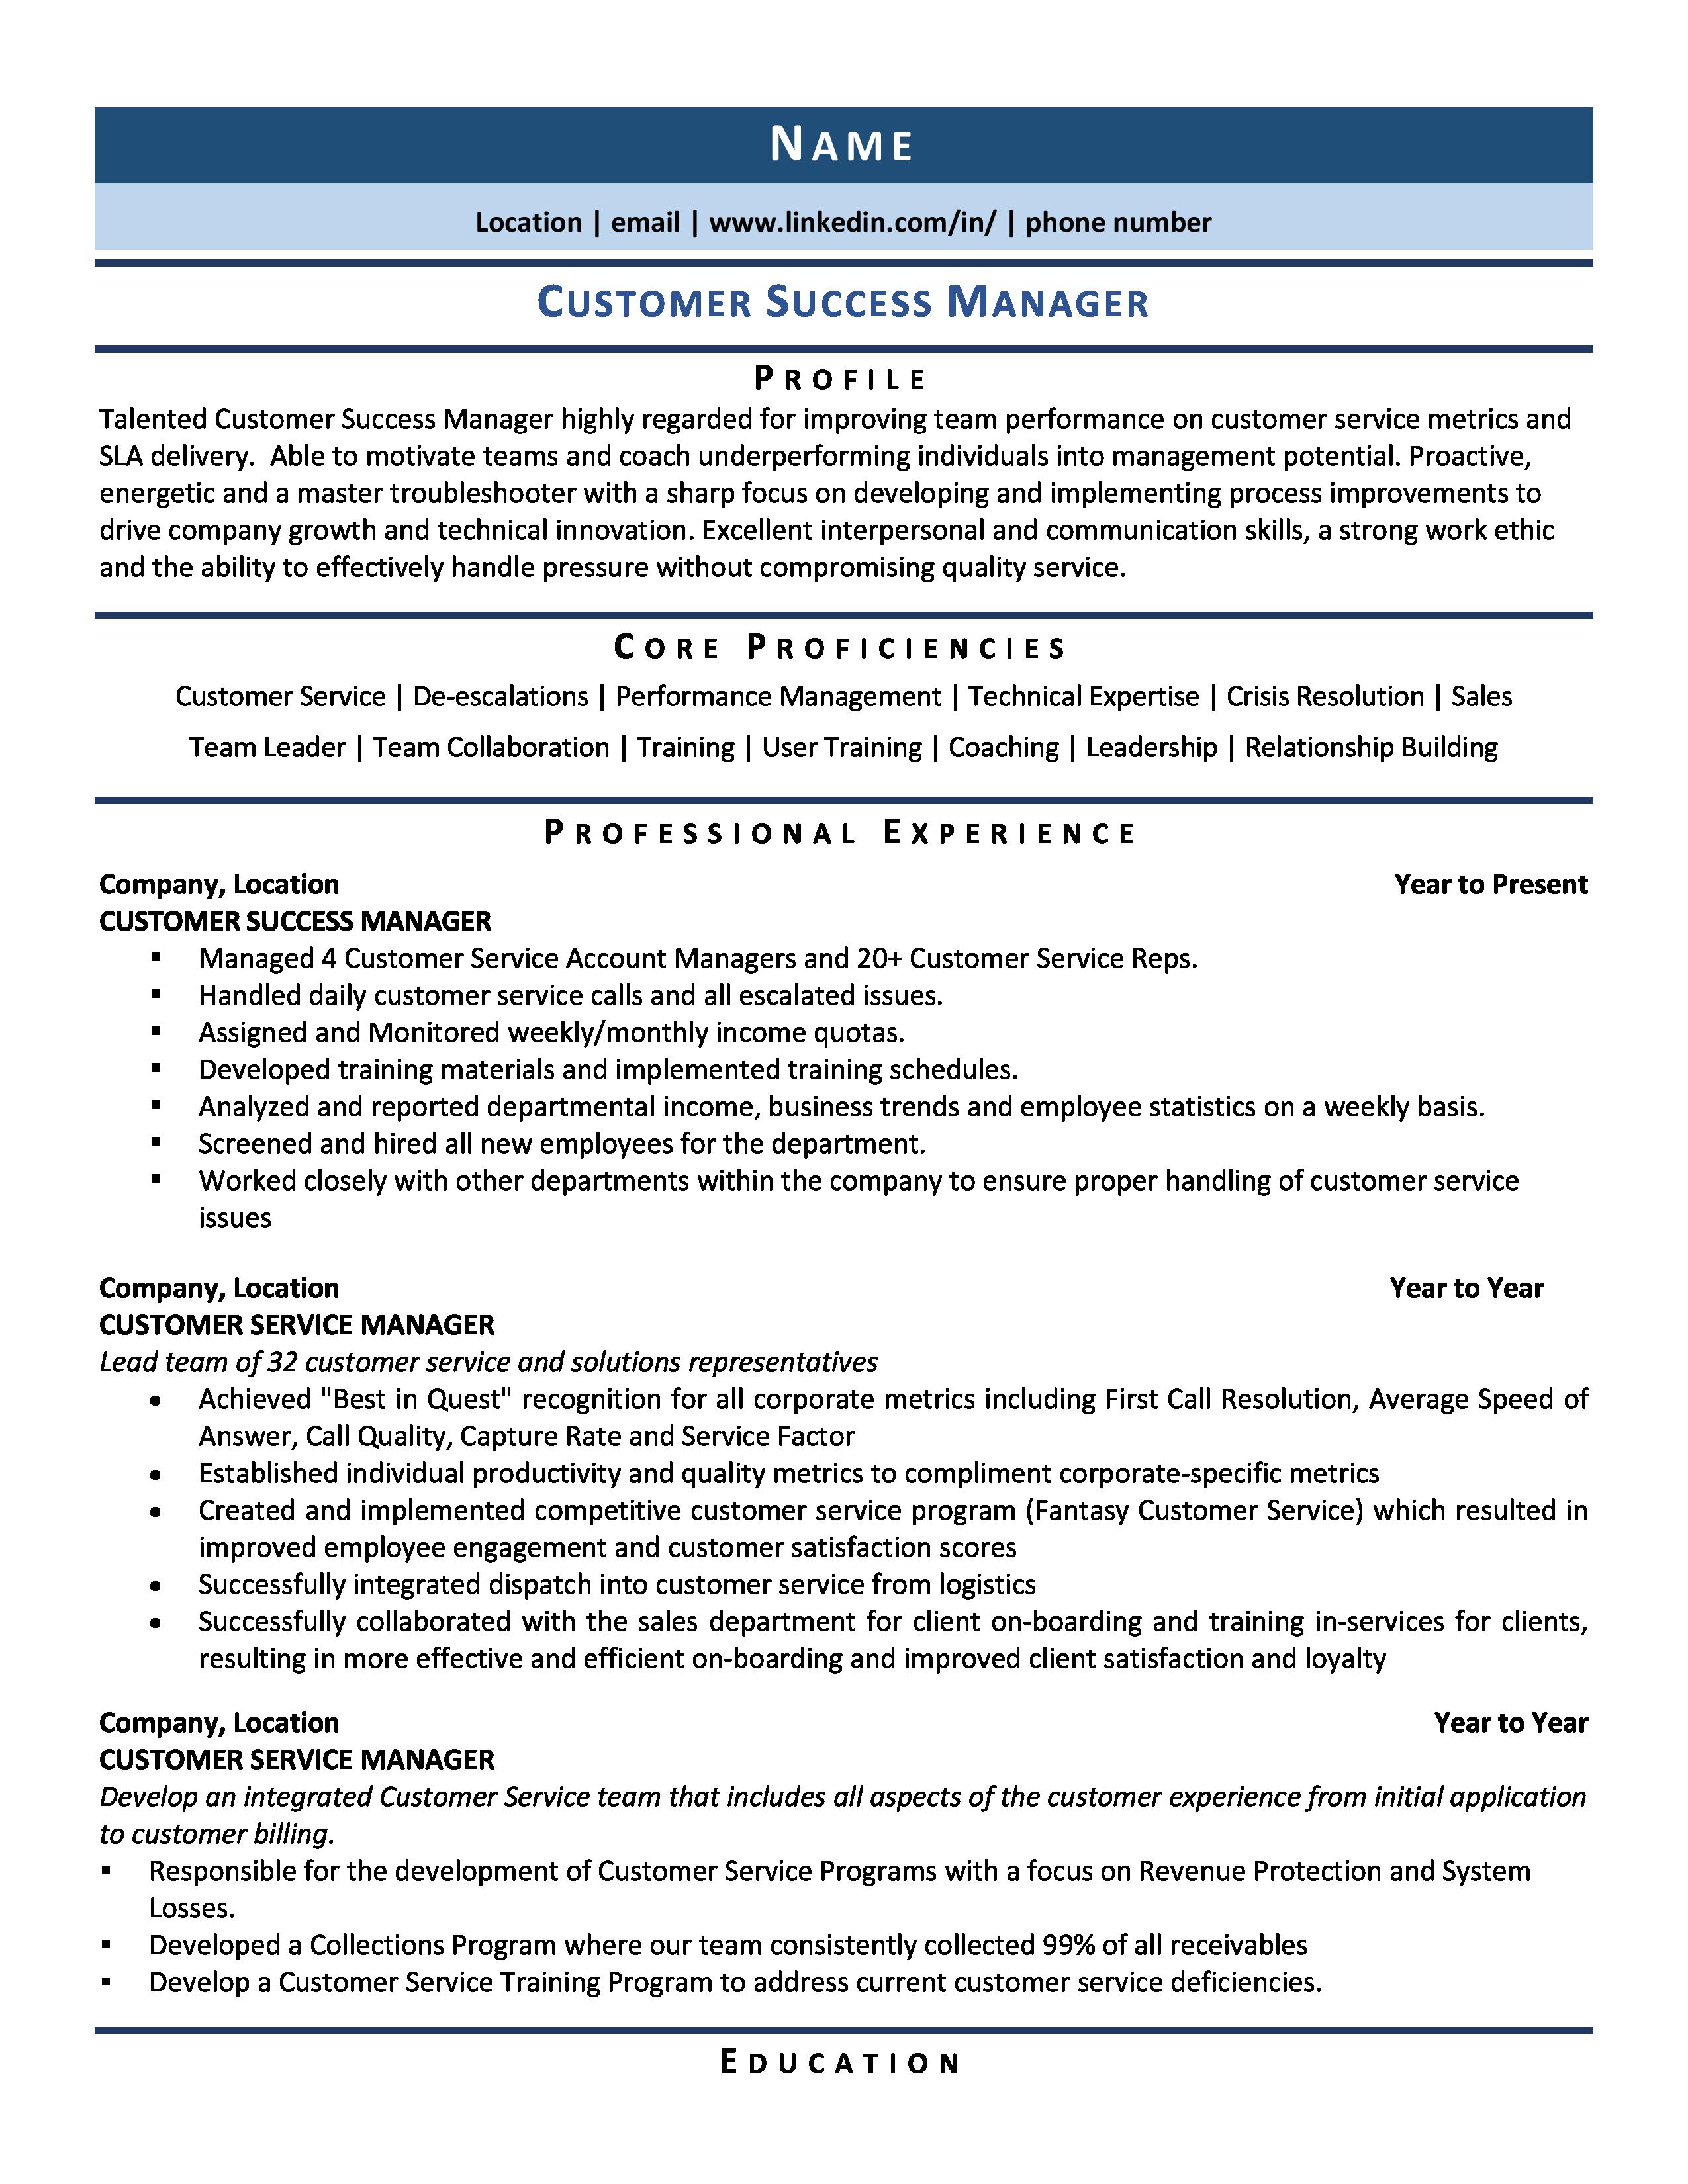 Customer Success Manager Resume Samples Template For 2020 Manager Resume Customer Service Resume Examples Customer Service Resume